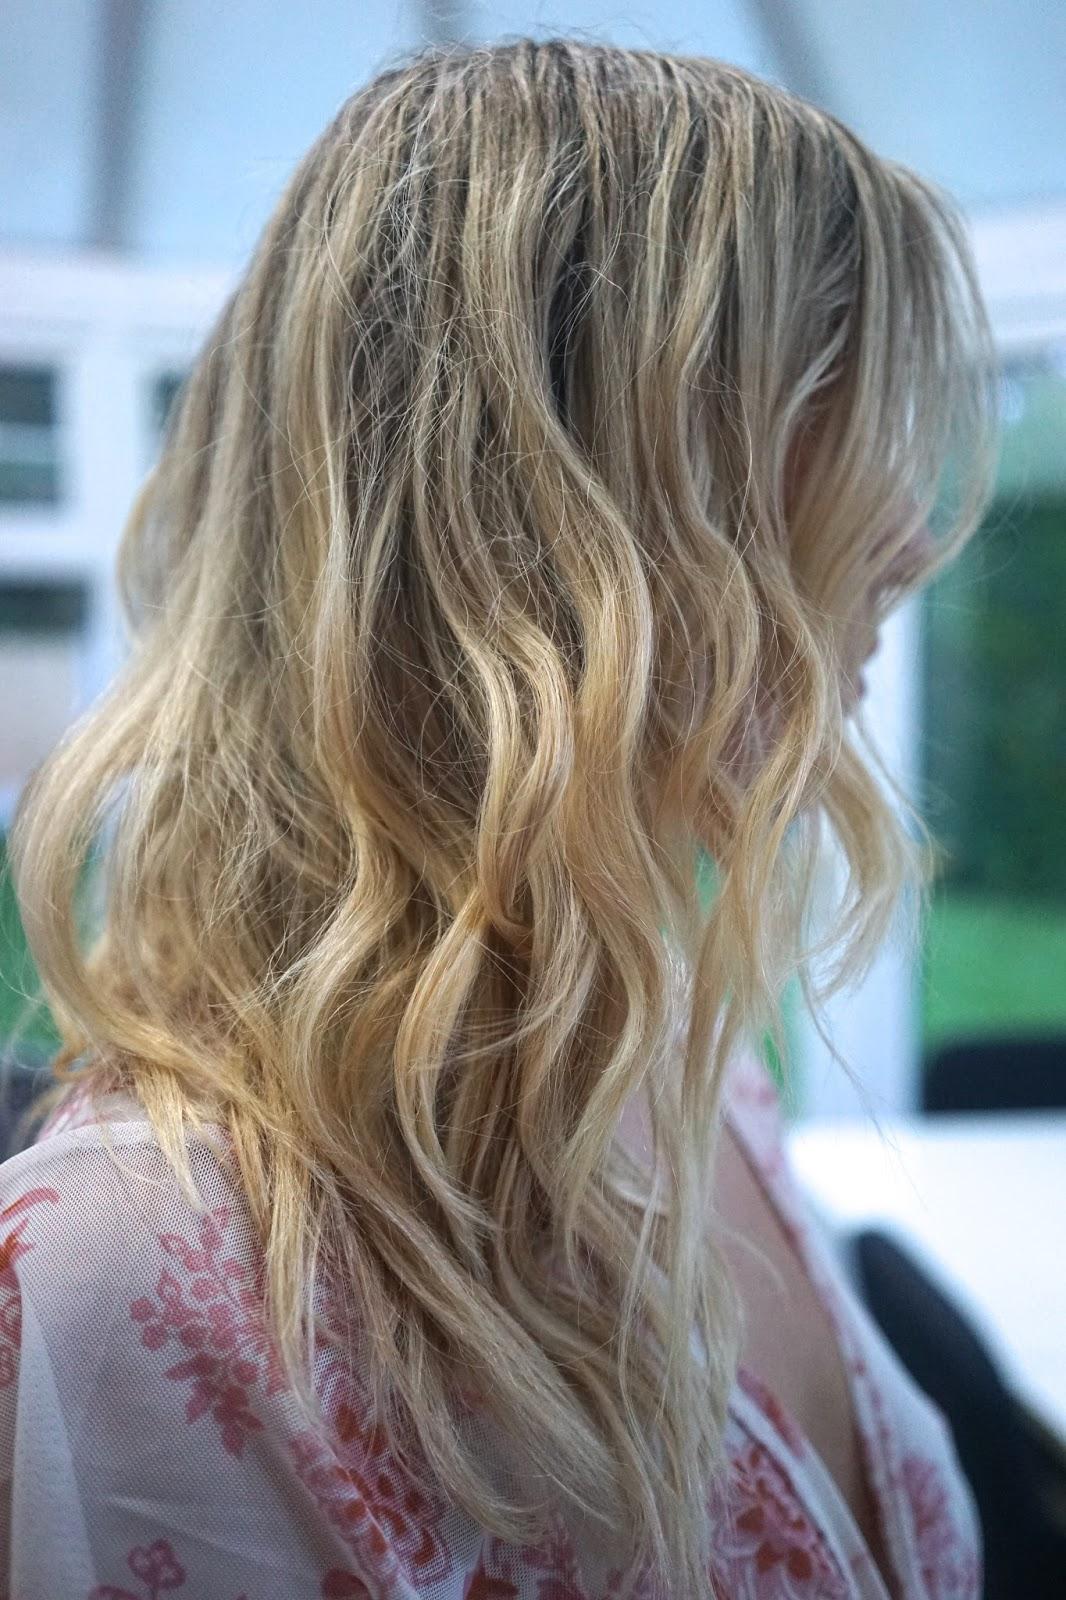 Ghd Hair Styles Amusing Emtalks Ghd Curve Curling Wand Review